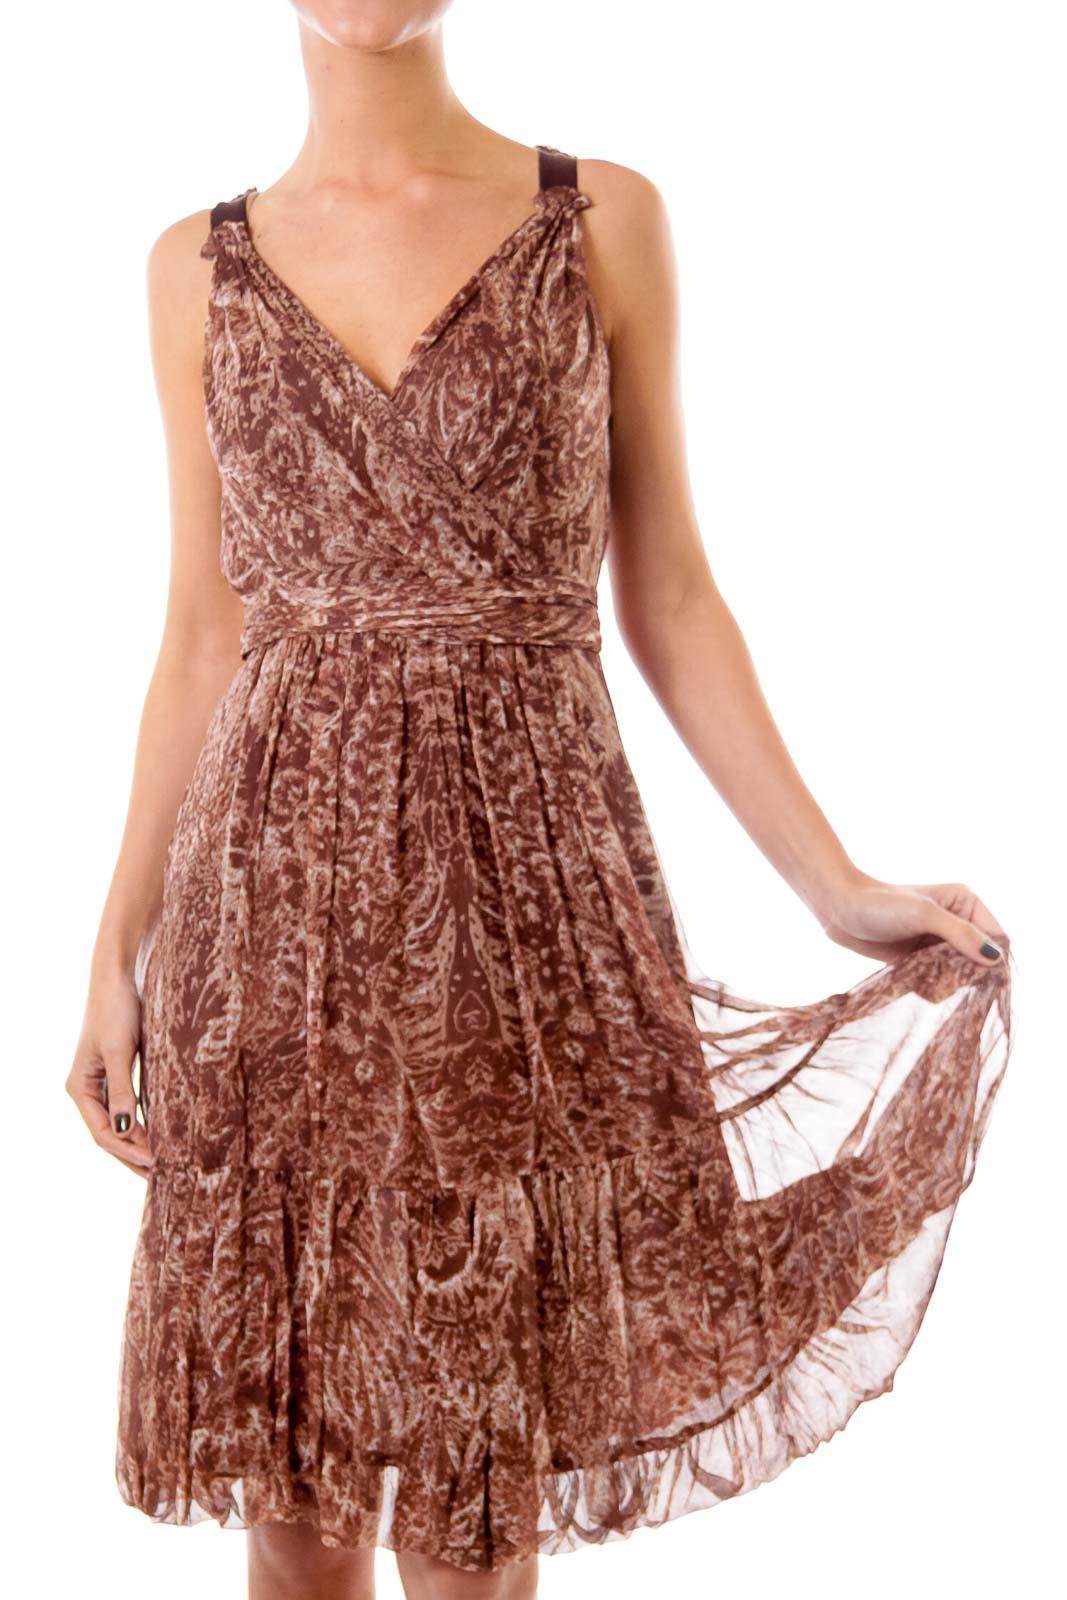 Brown Chiffon Empire Dress